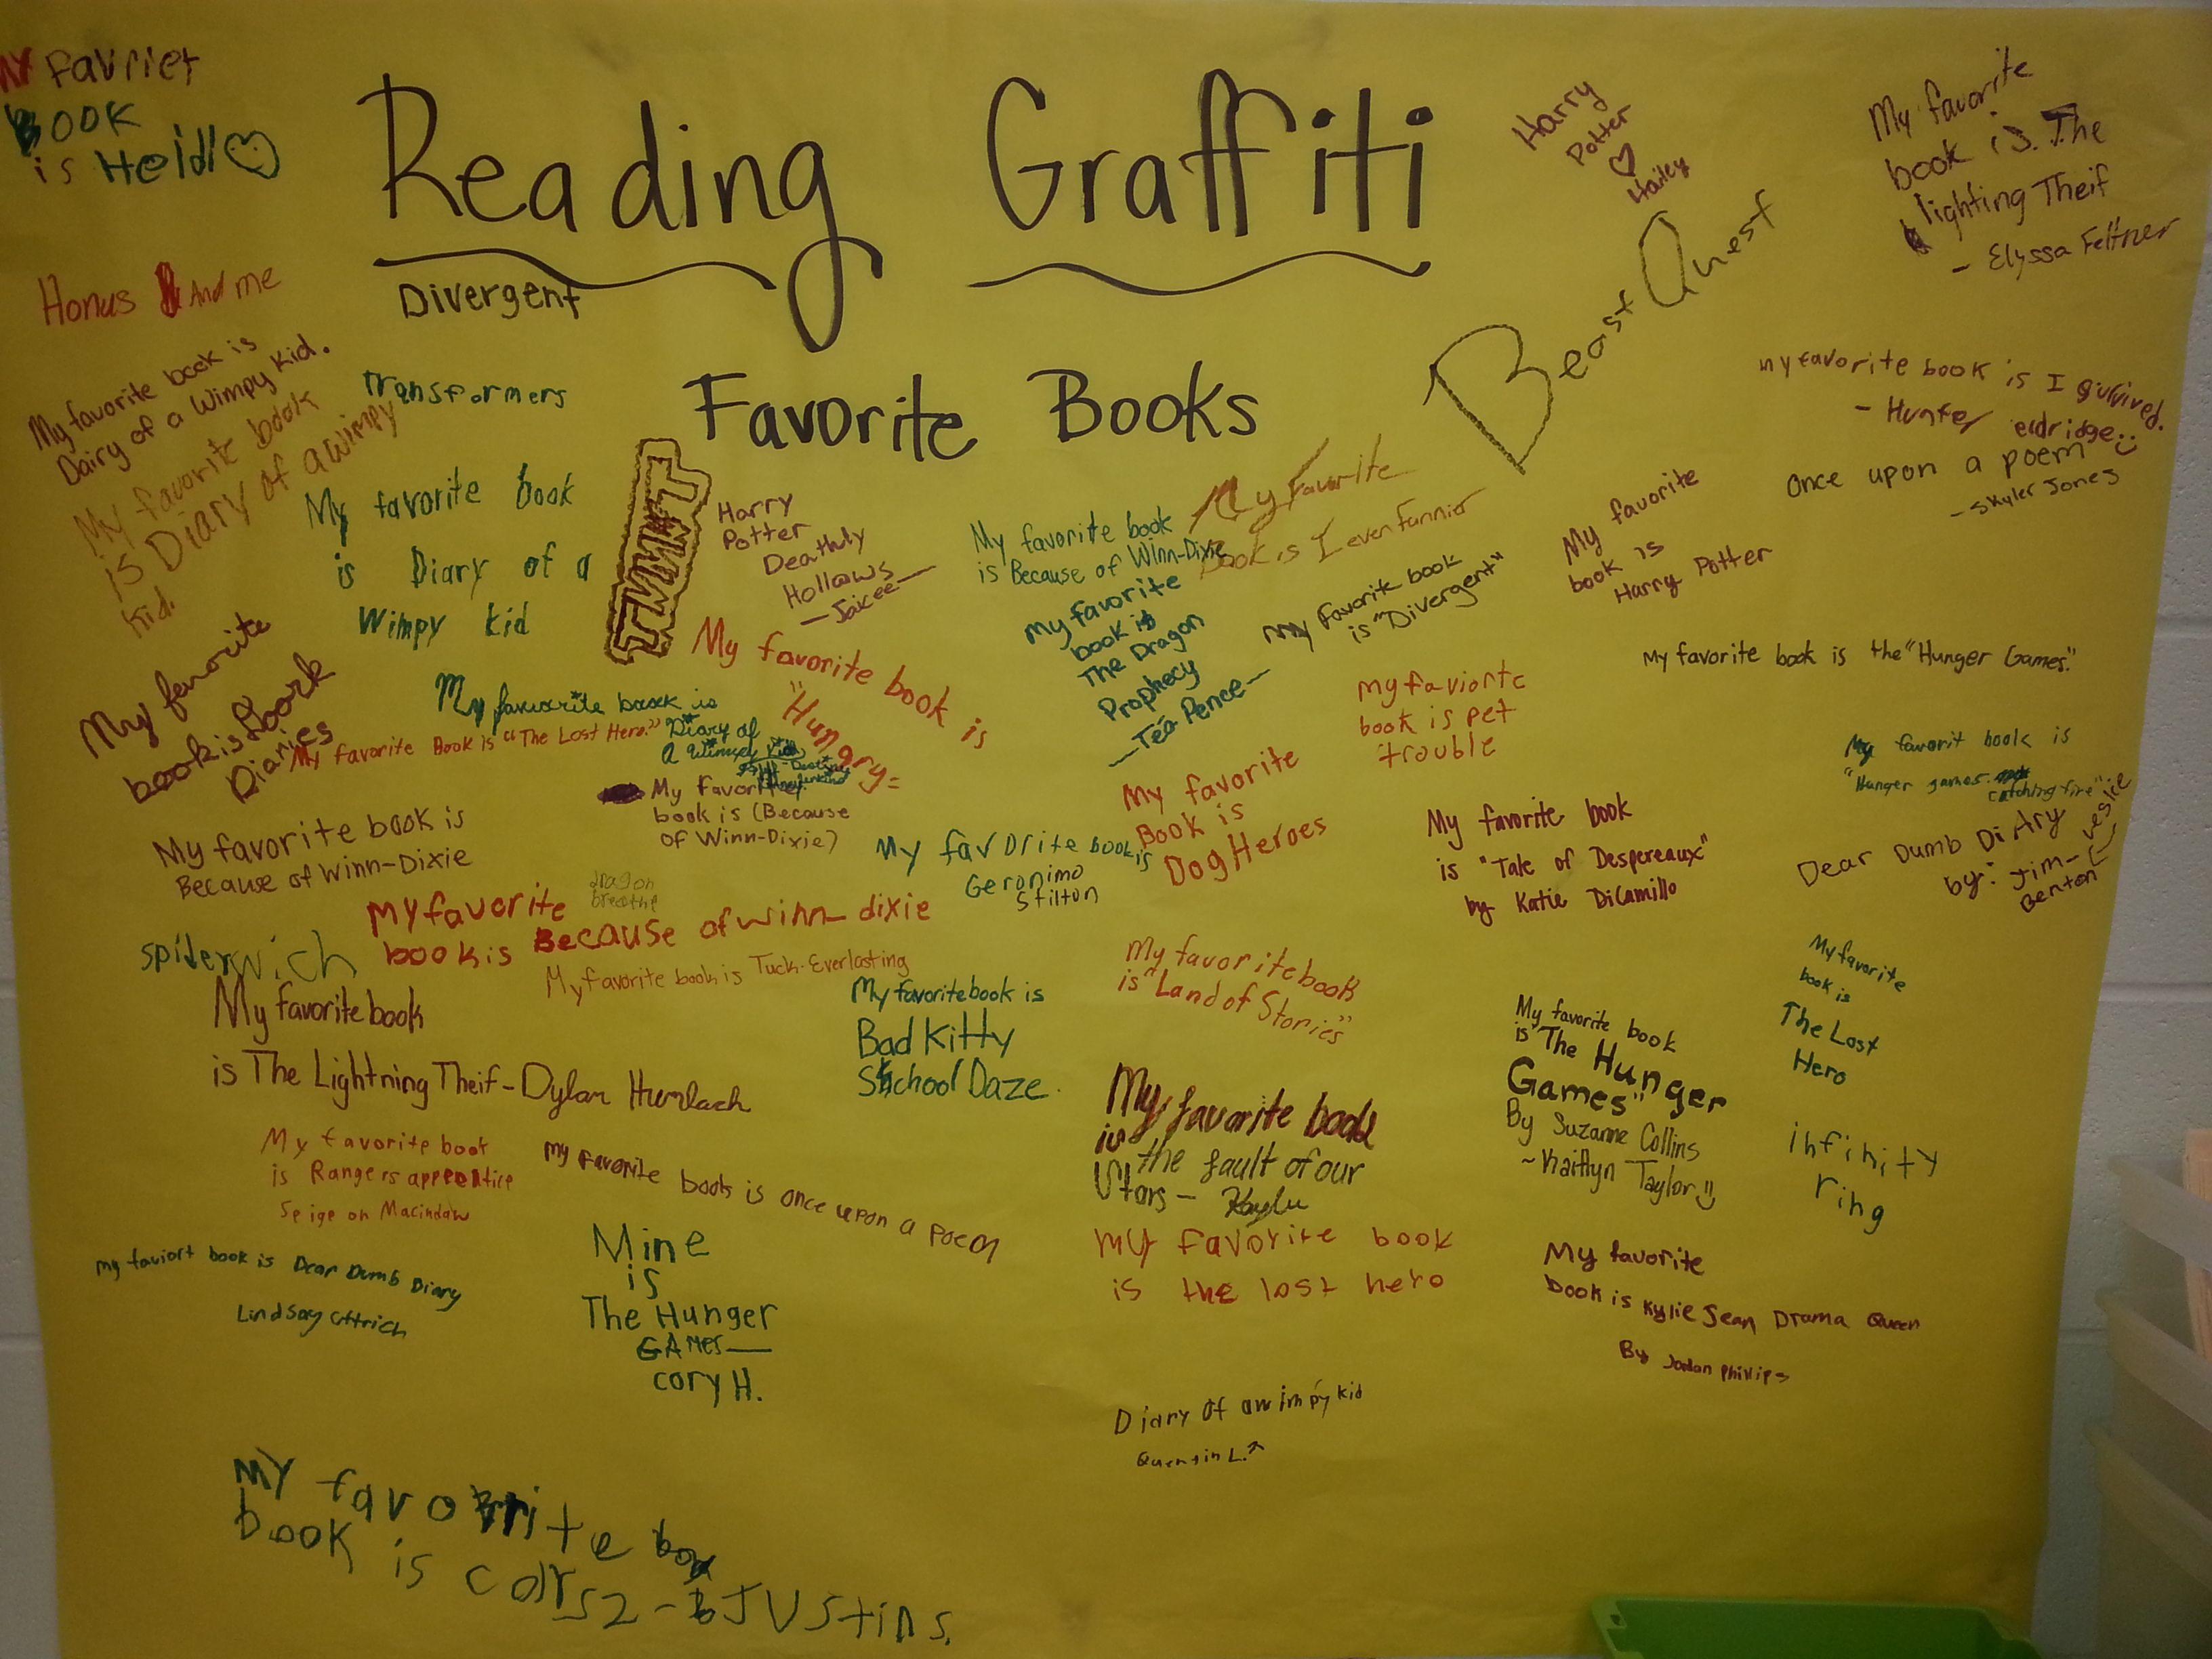 Graffiti wall activity - Reading Graffiti Wall